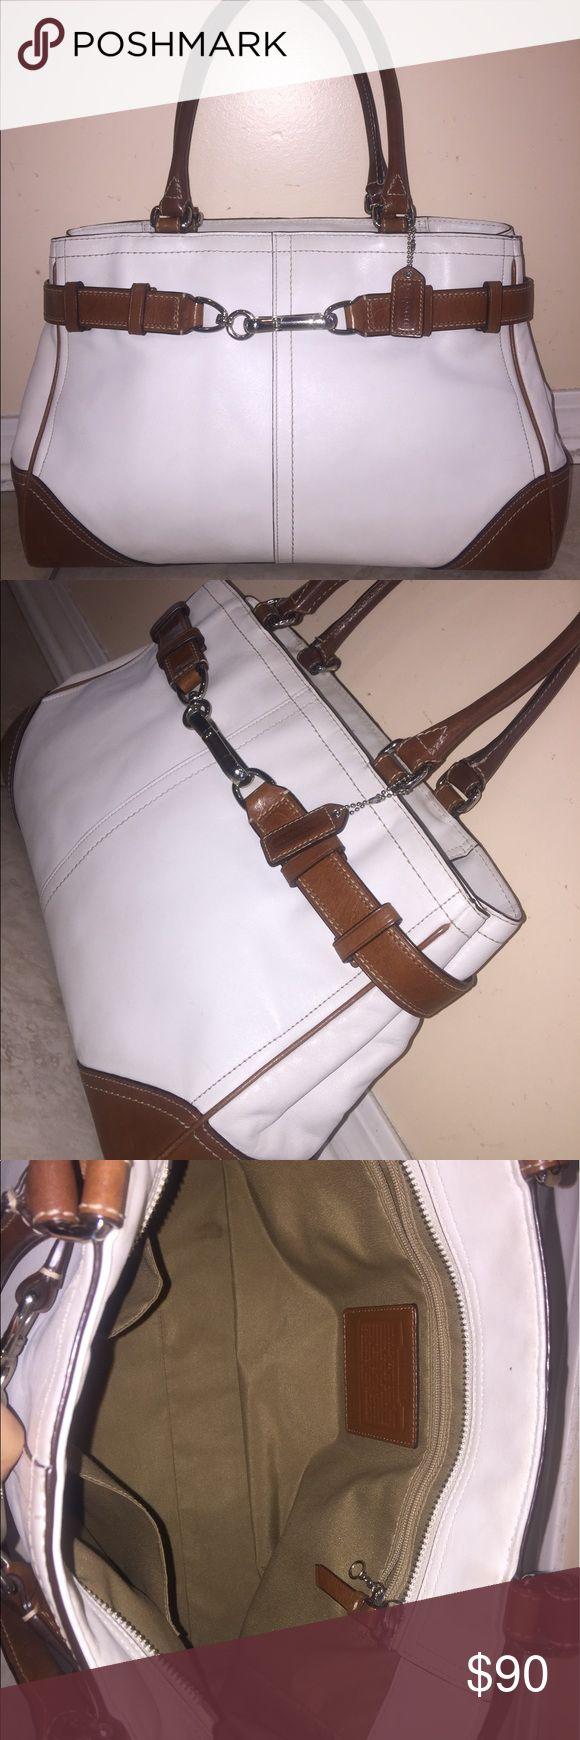 Coach leather handbag Authentic Coach handbag in excellent condition. White color with brown trims. Coach Bags Satchels